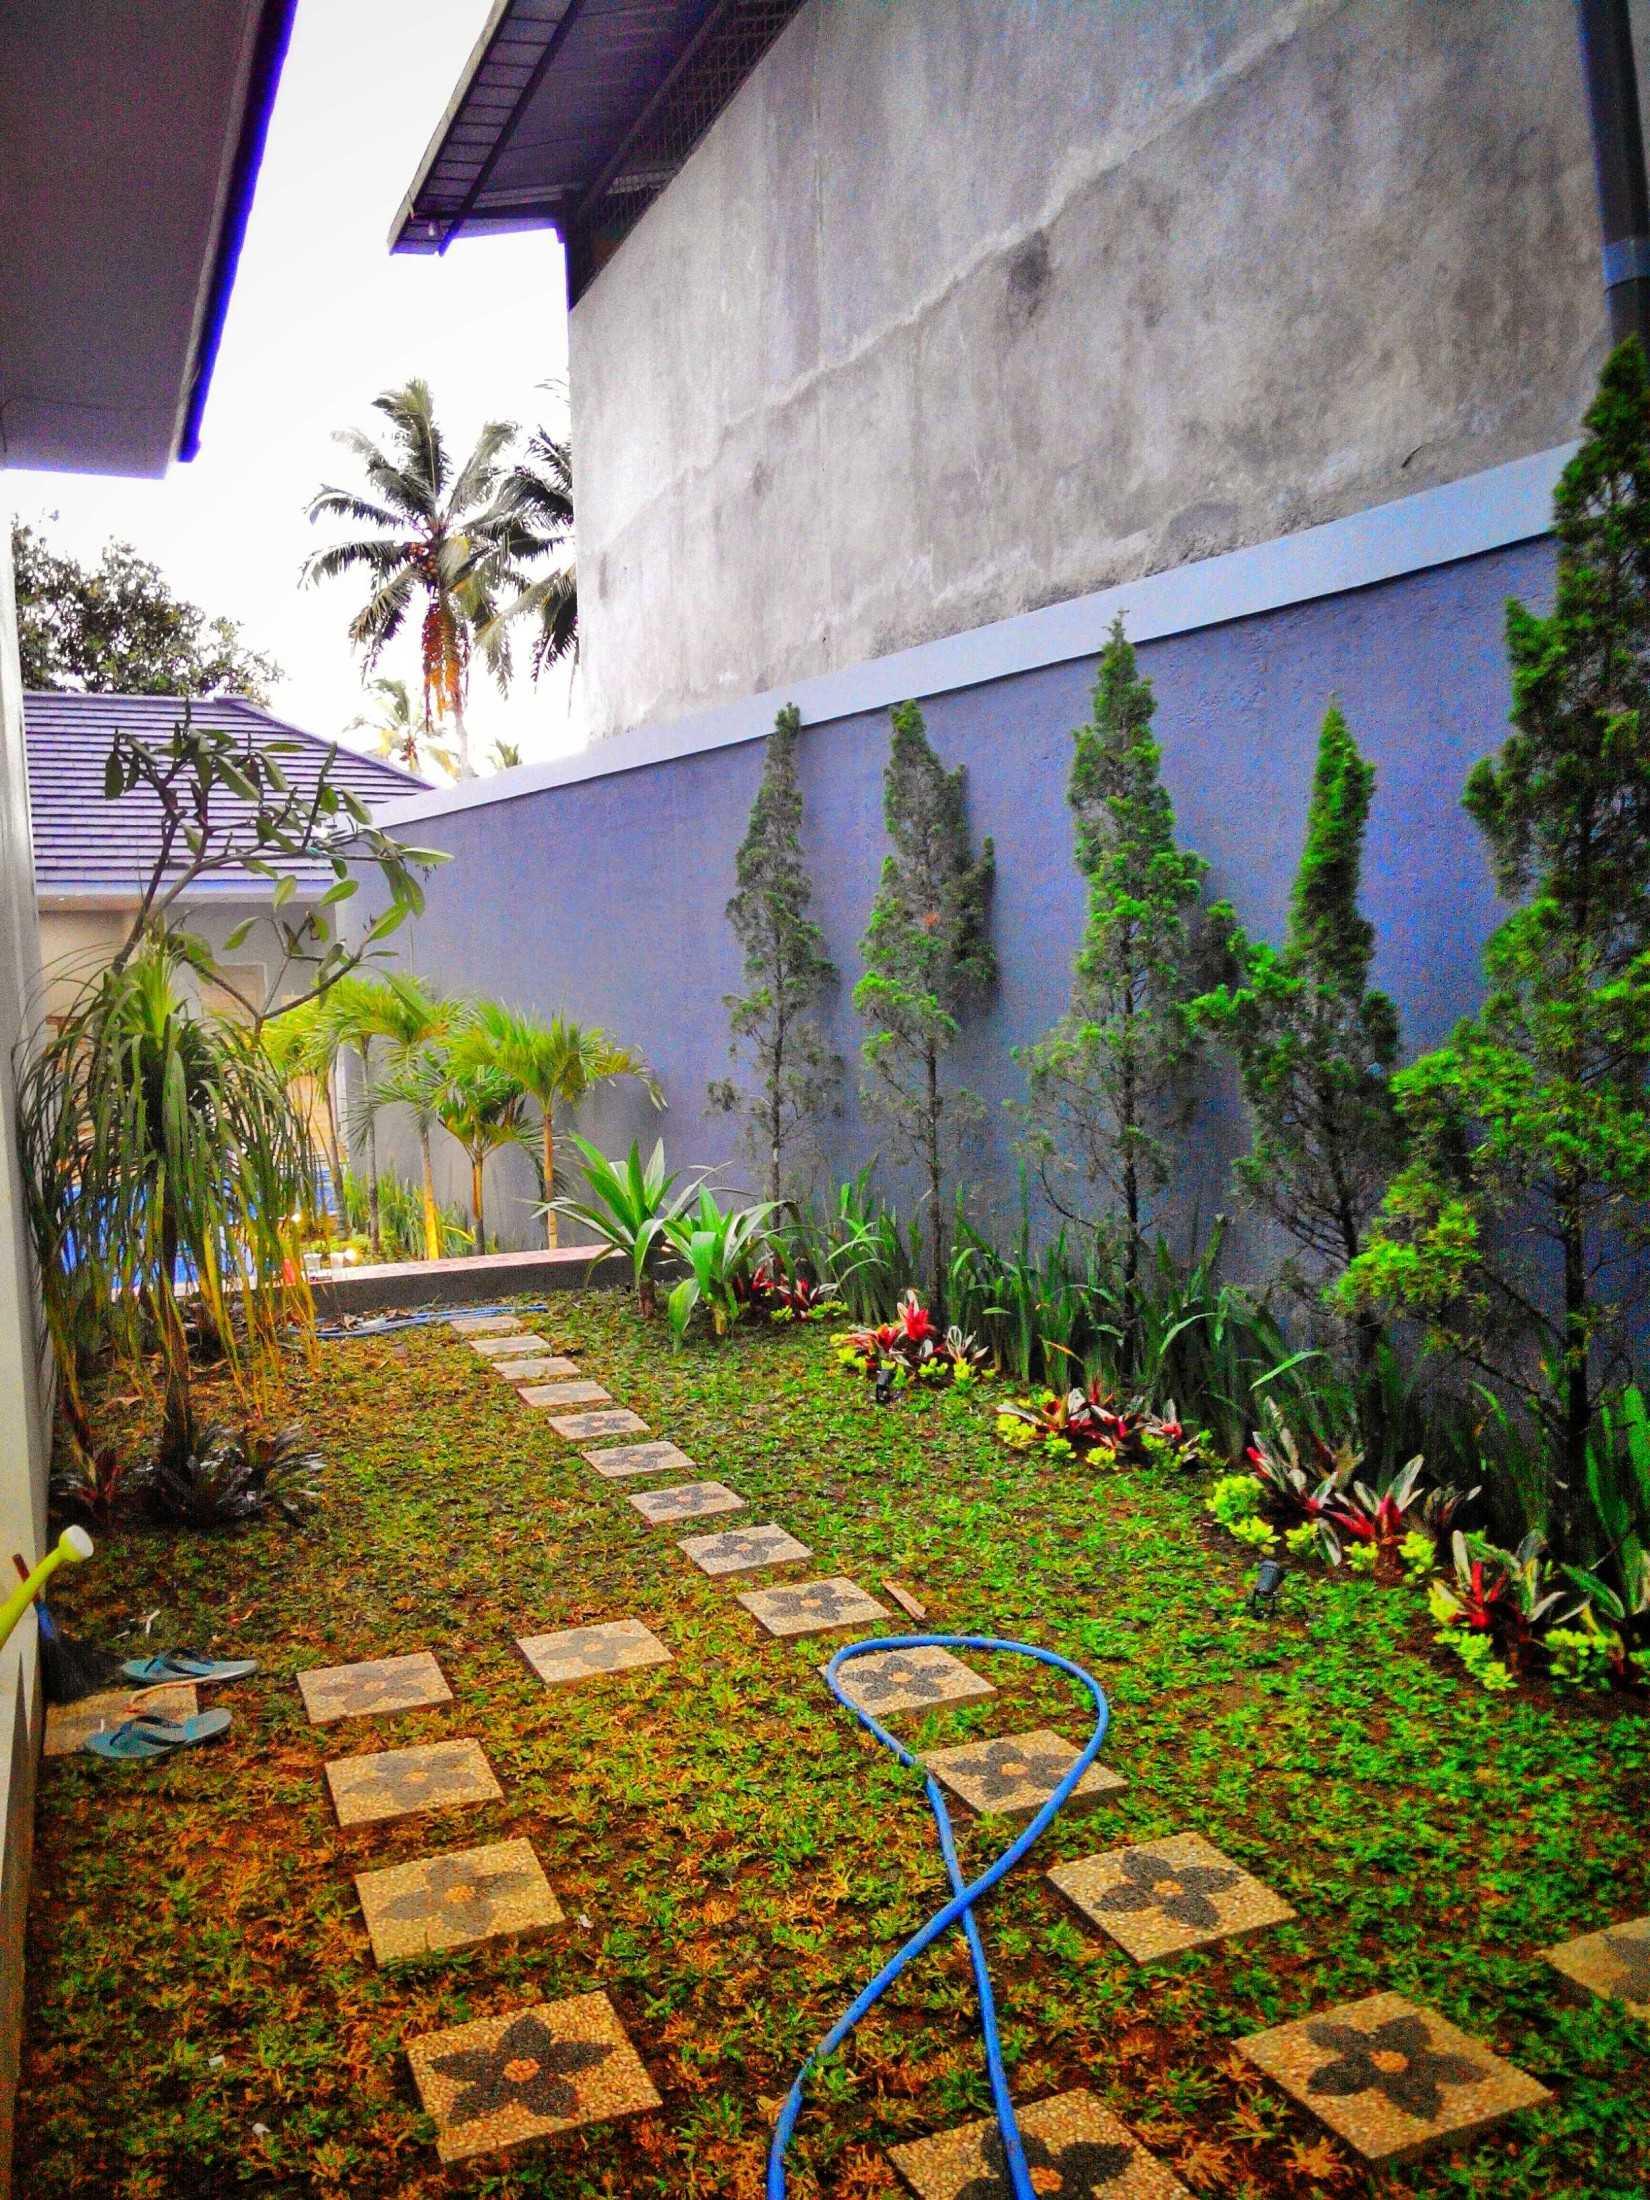 Larch Architecture Team Rumah Tinggal Bpk. Ralis Karangnunggal, Tasikmalaya, Jawa Barat, Indonesia Karangnunggal, Tasikmalaya, Jawa Barat, Indonesia Larch-Architecture-Team-Rumah-Tinggal-Bpk-Ralis  67042